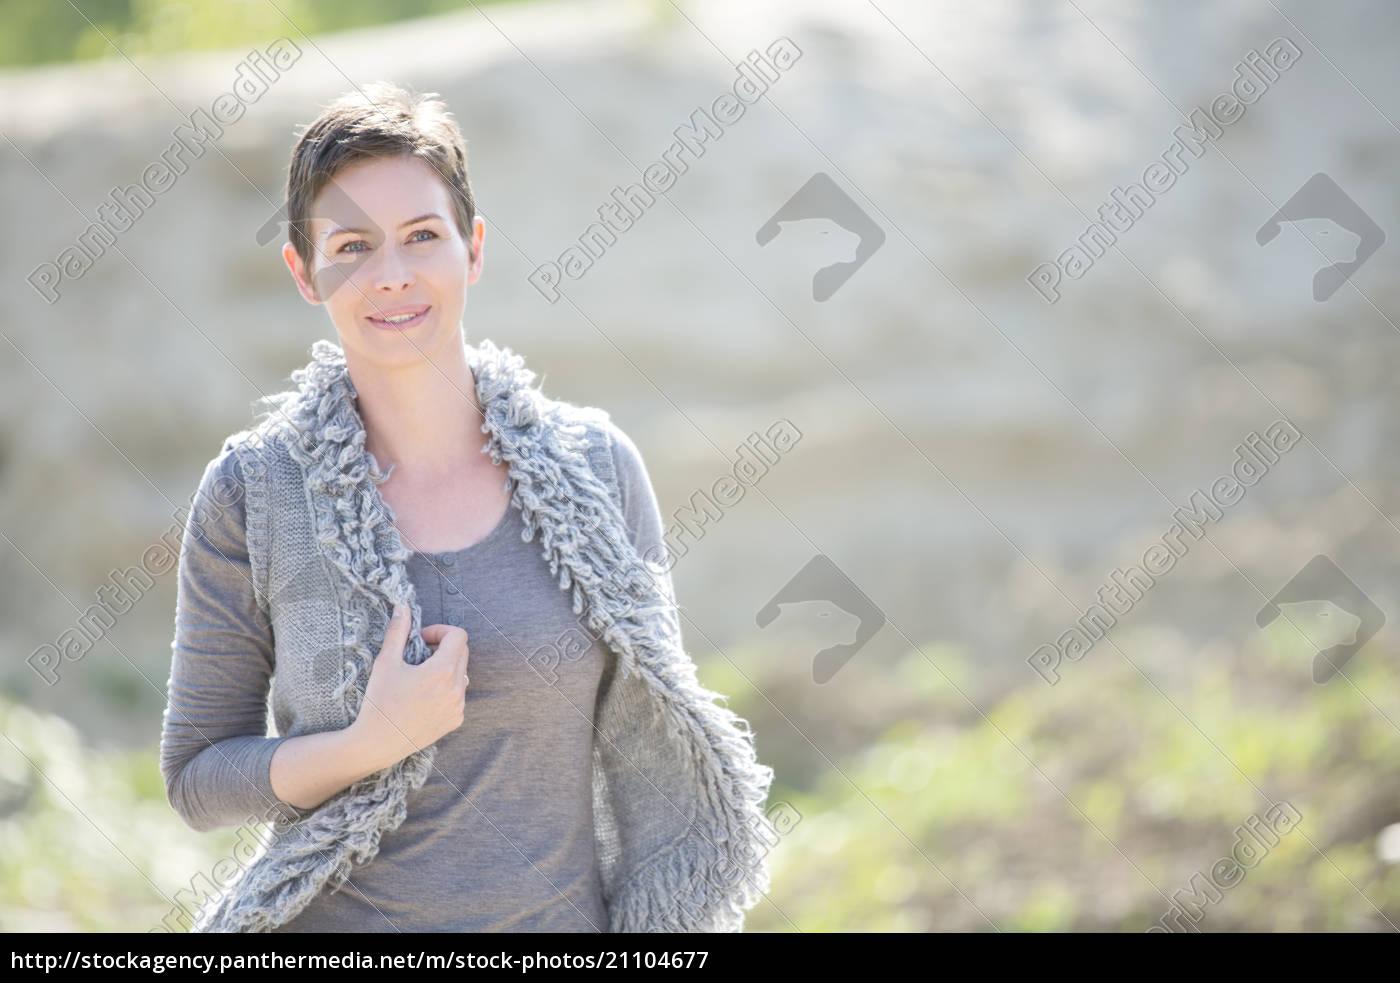 portrait, of, smiling, woman, wearing, grey - 21104677